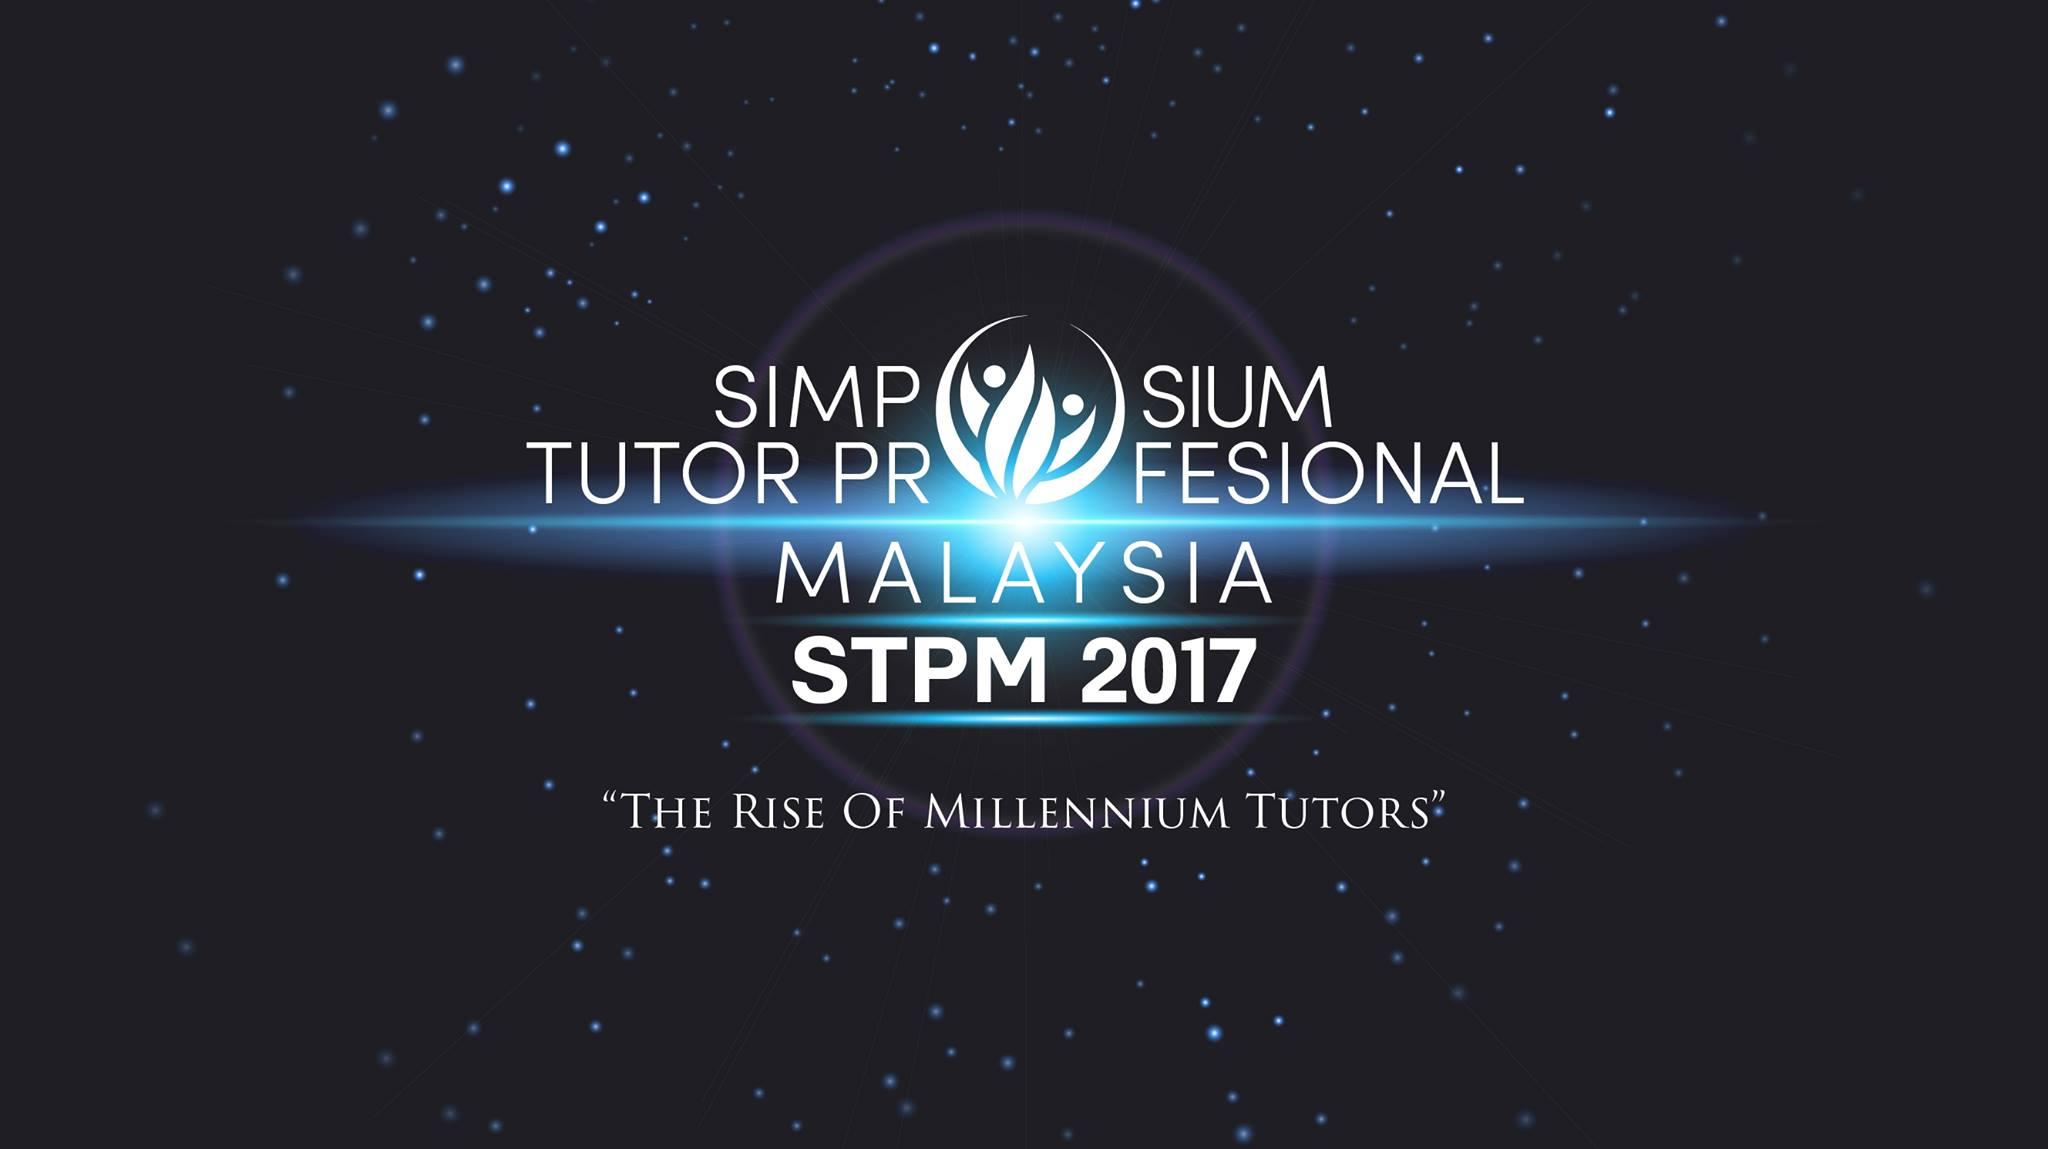 bisnes tuisyen tutoring business malaysia